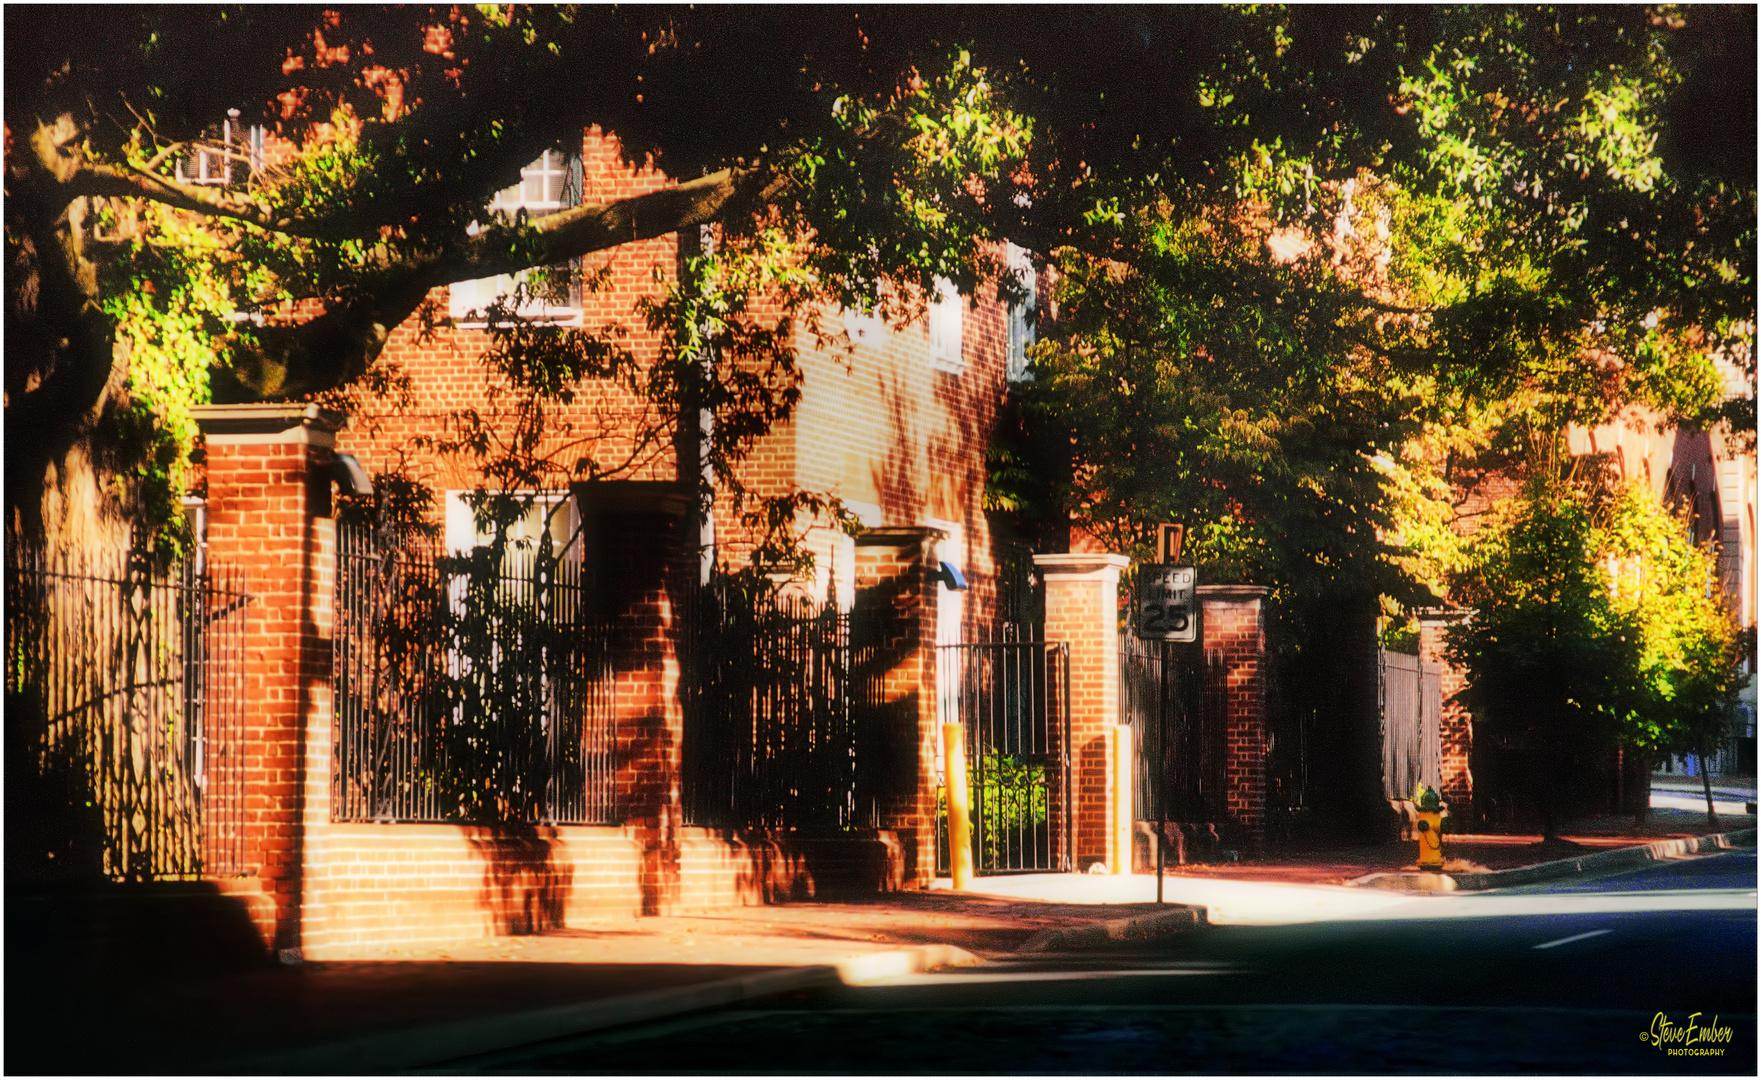 Early Autumn - An Annapolis Impression